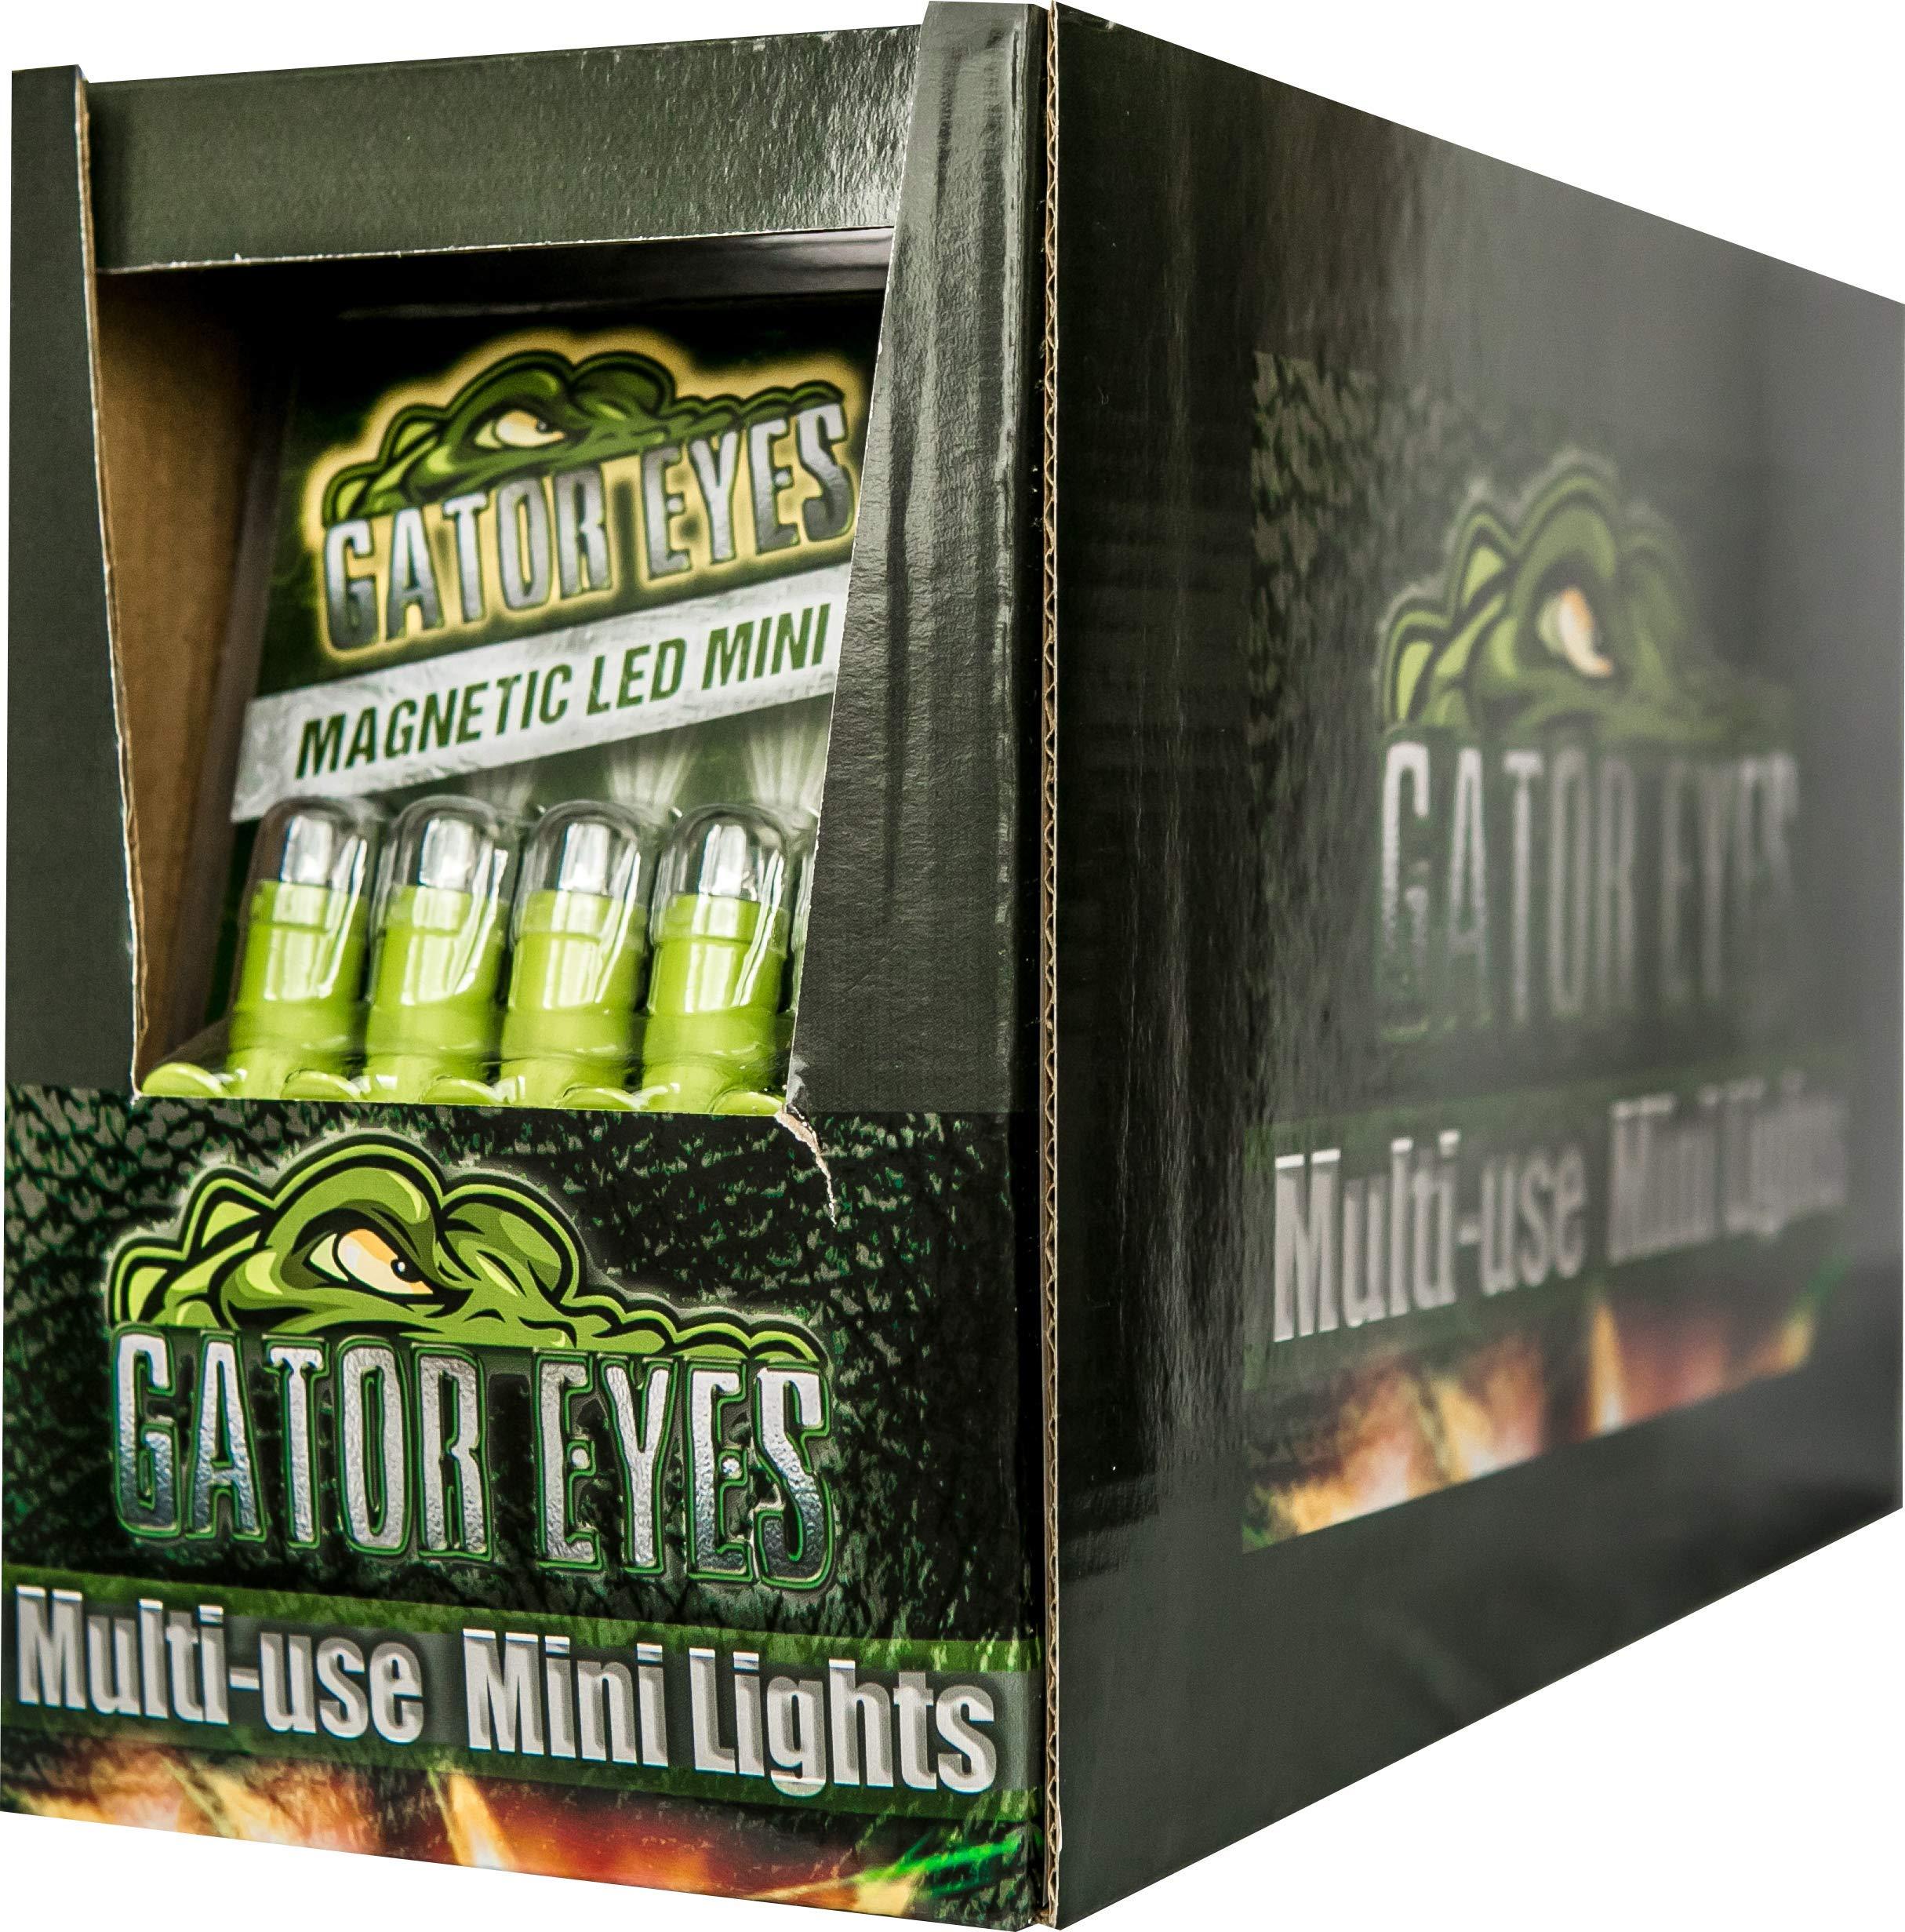 Gatoreye Vendor Pack by GATOR EYES